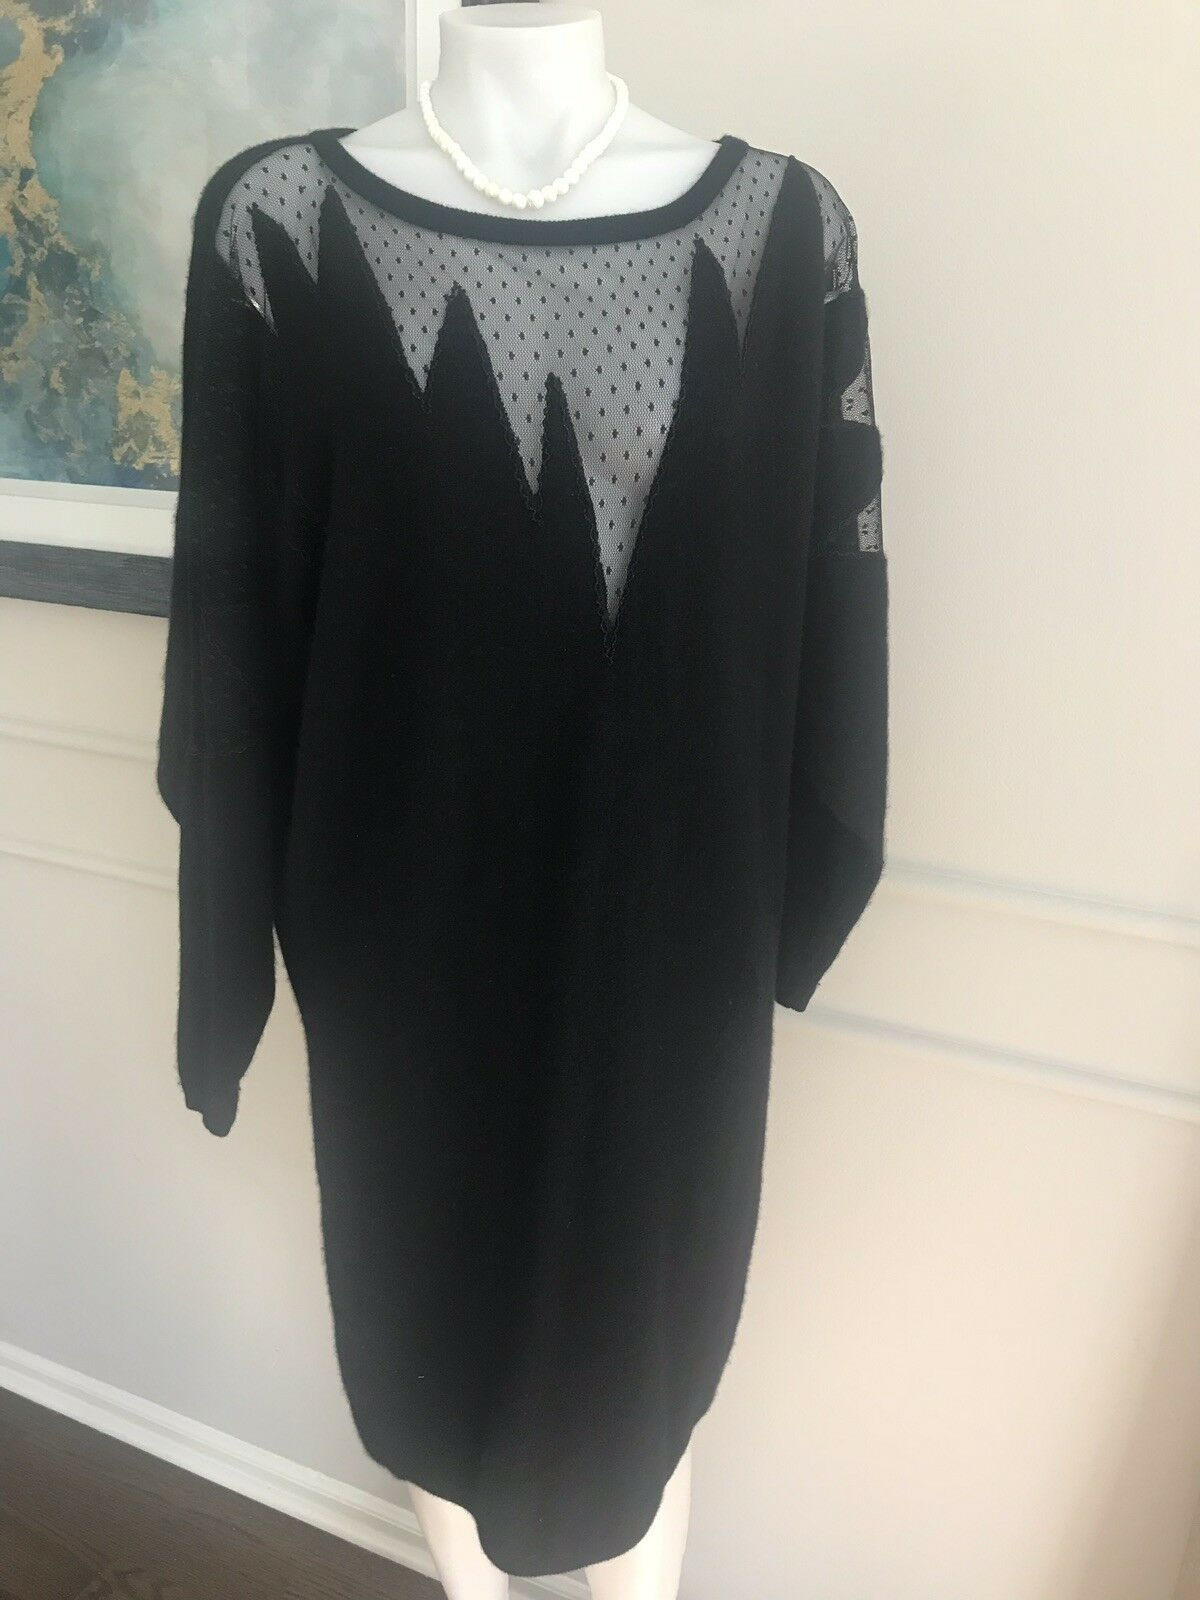 Adrianne Vittadini Woman's Dress Wool Angora schwarz Sexy Long Sleeve Größe Large